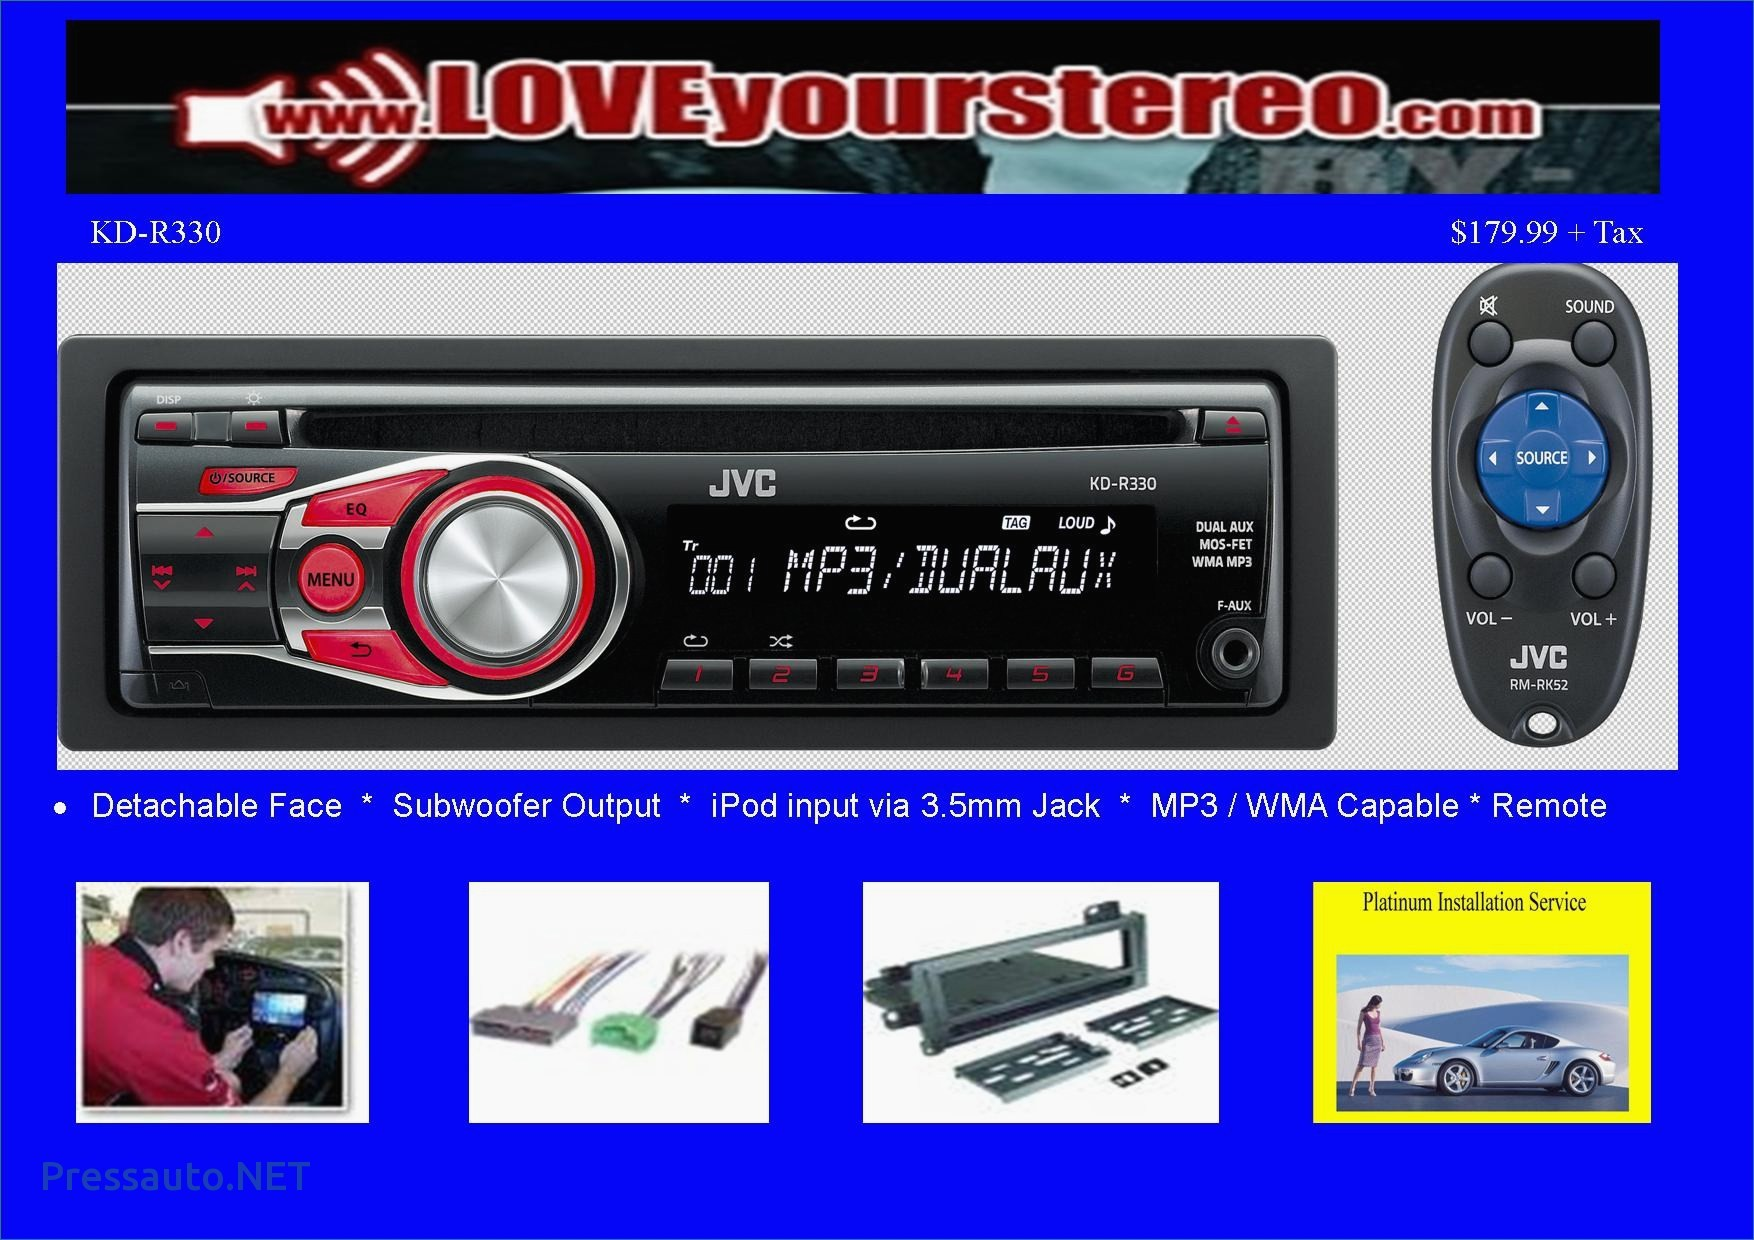 JVC KD R300 Wiring Harness jvc car stereo radio wire wiring harness 16 pin plug kdr320